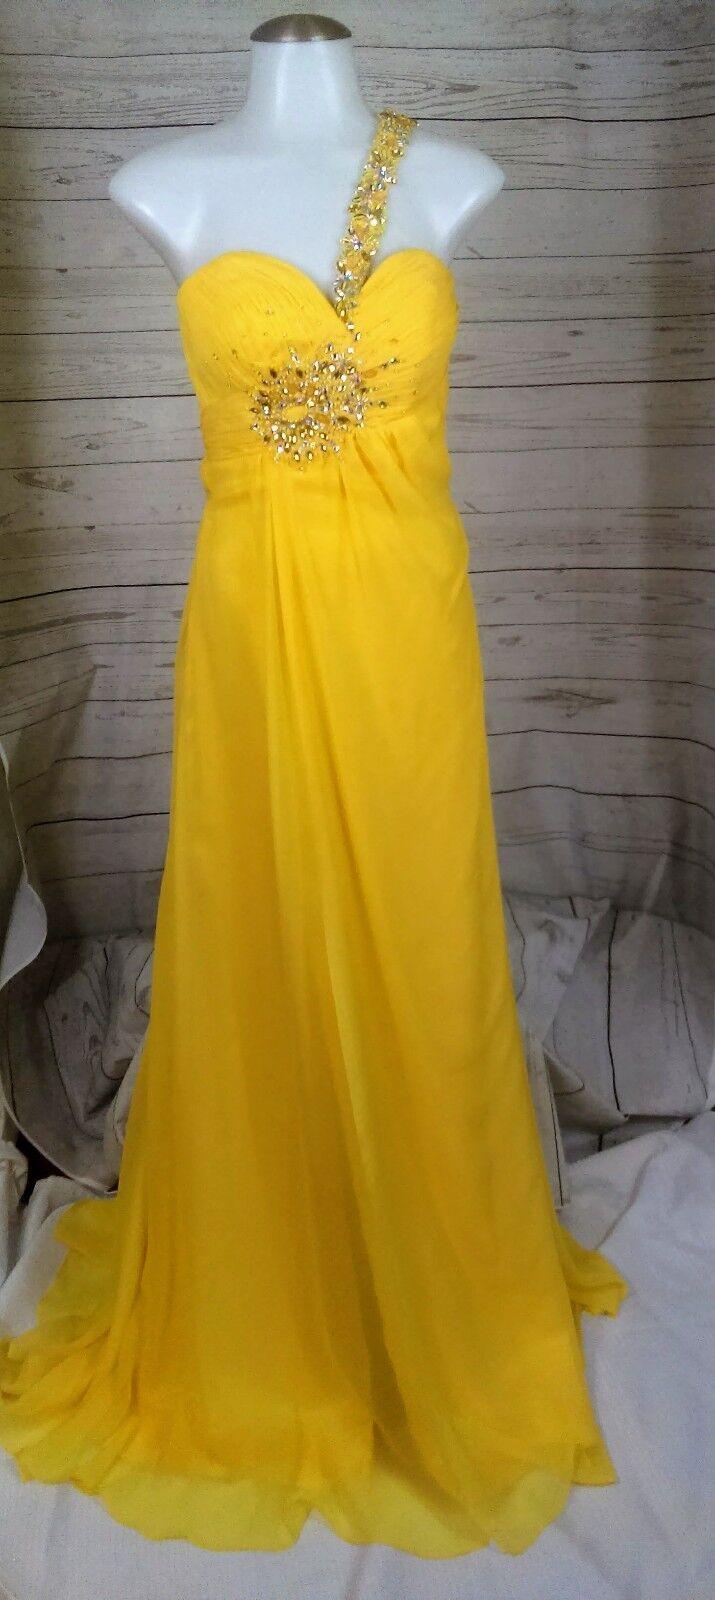 Crush Prom Womens Prom Pageant Evening Dress Dress Dress Sz 2 Yellow 1 Shoulder New B9 117 ab82d6